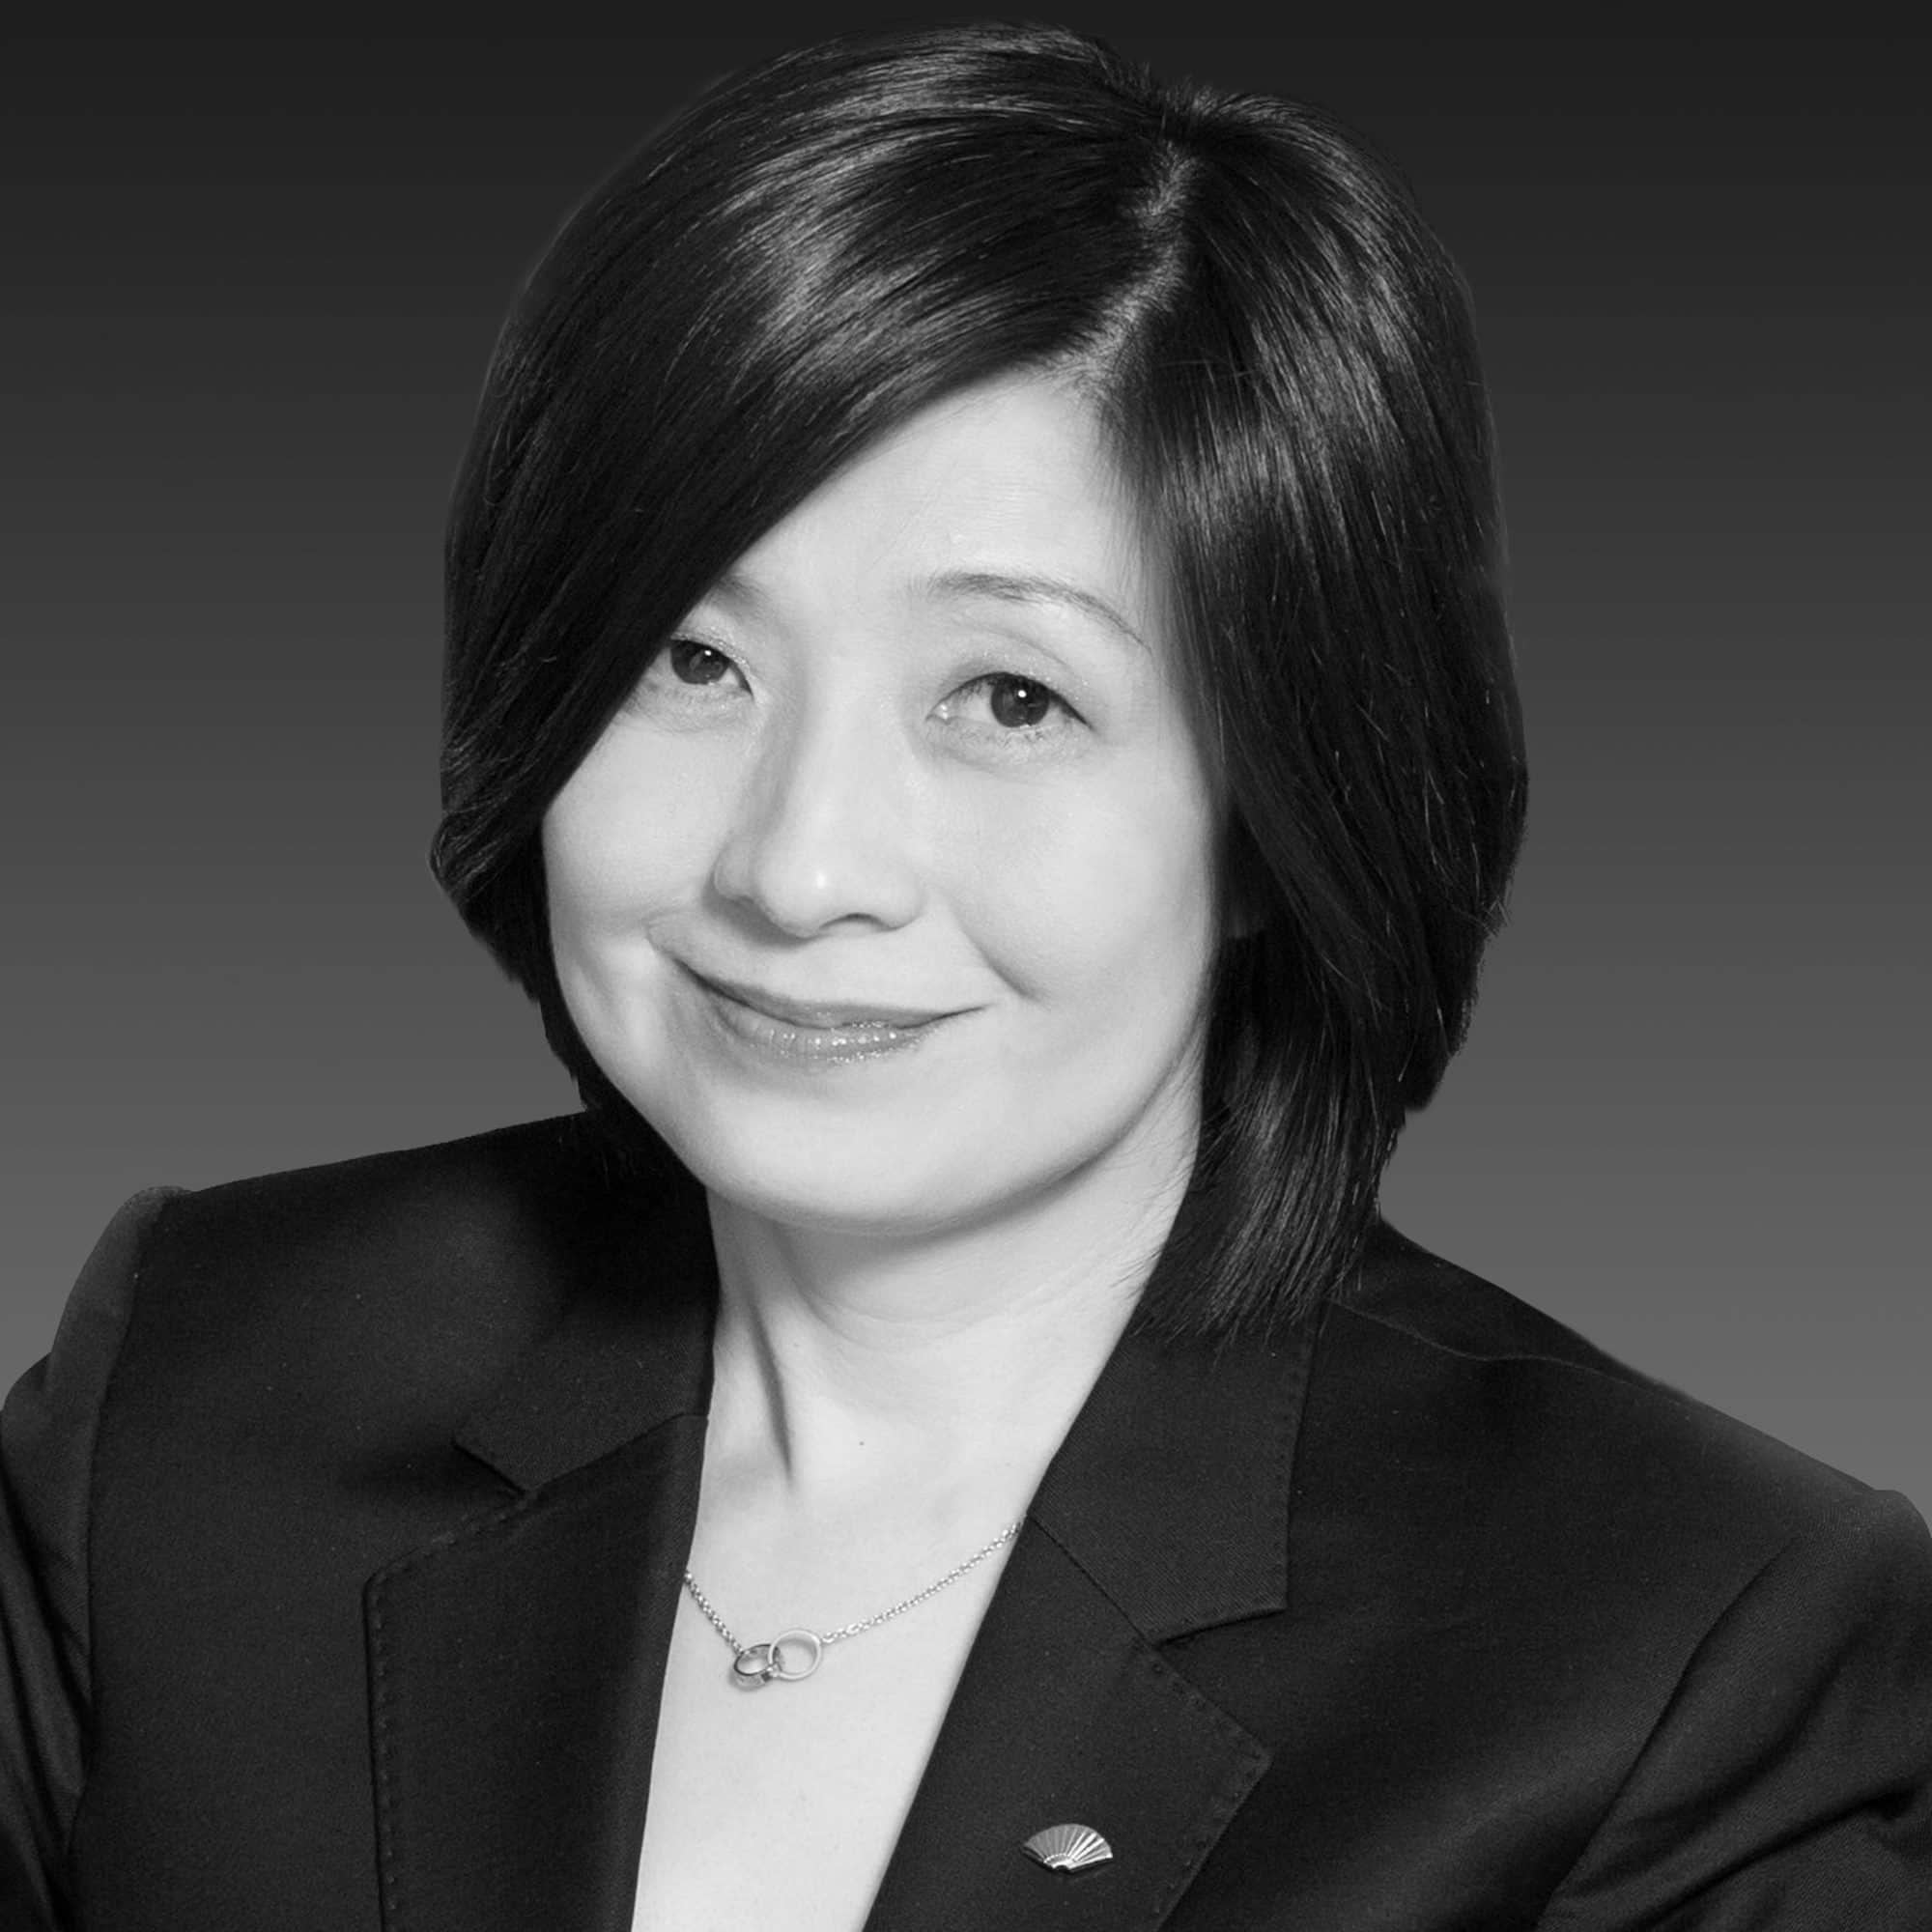 Luanne Li, Director of Marketing Communications